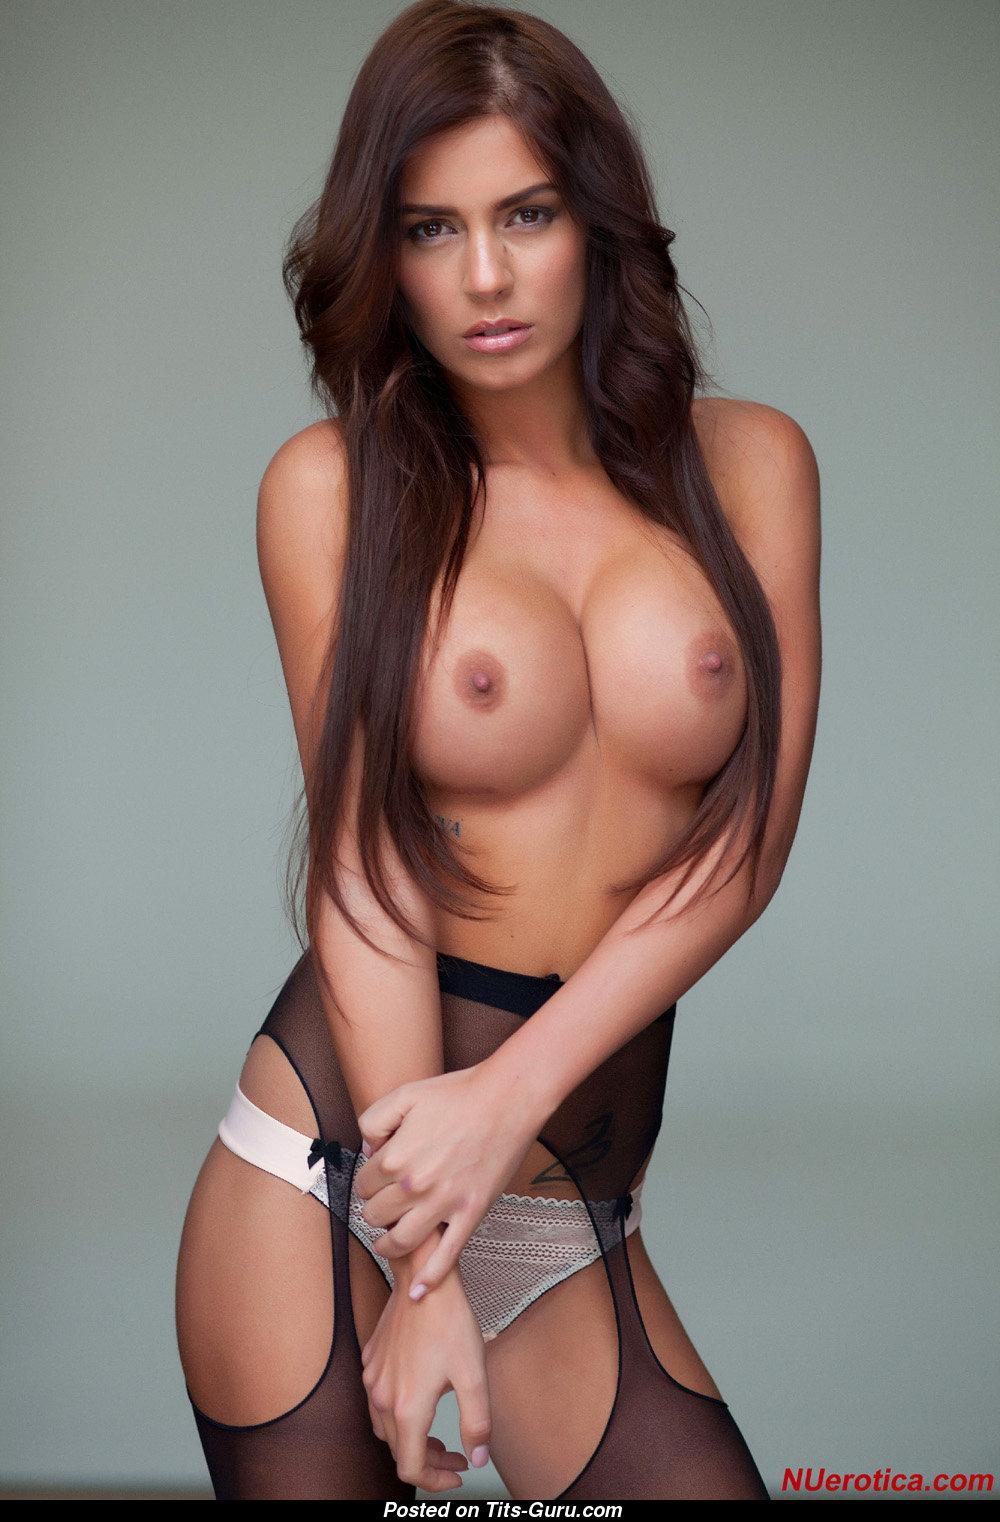 Alexa Varga - Naked Brunette With Big Fake Boobs Image -1611